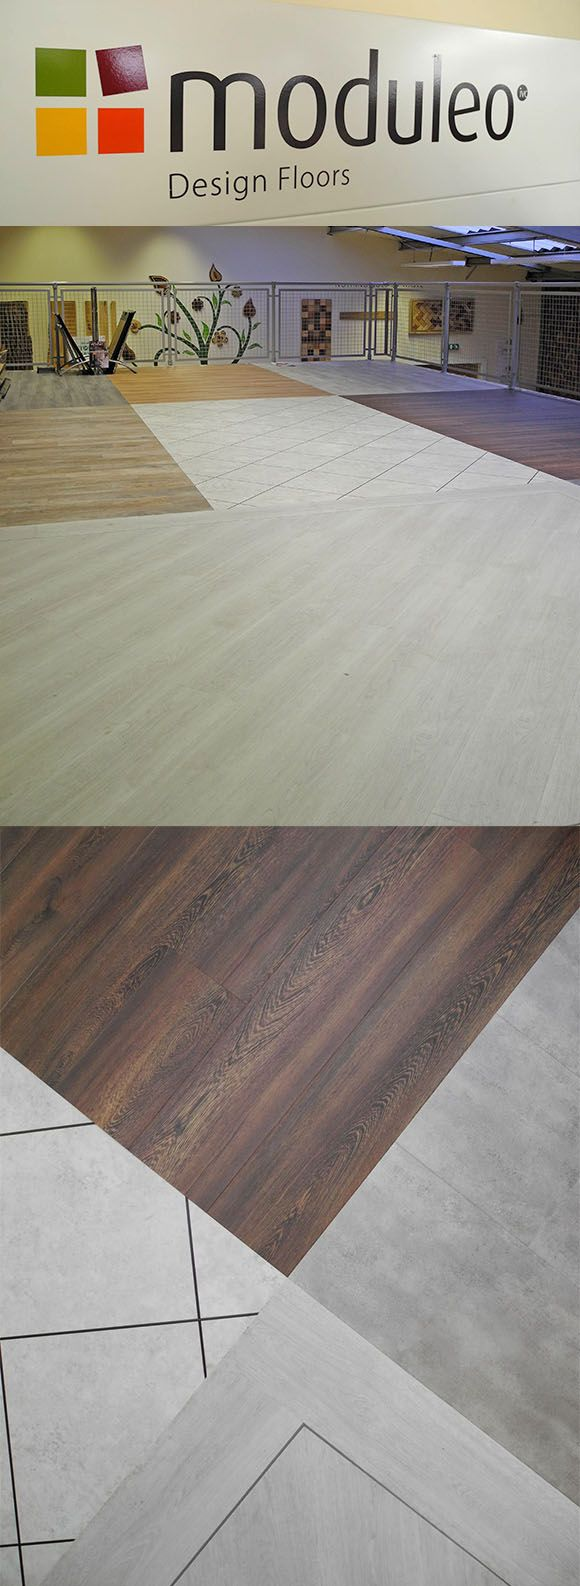 19 best images about floors on pinterest vinyls for Luxury flooring ideas